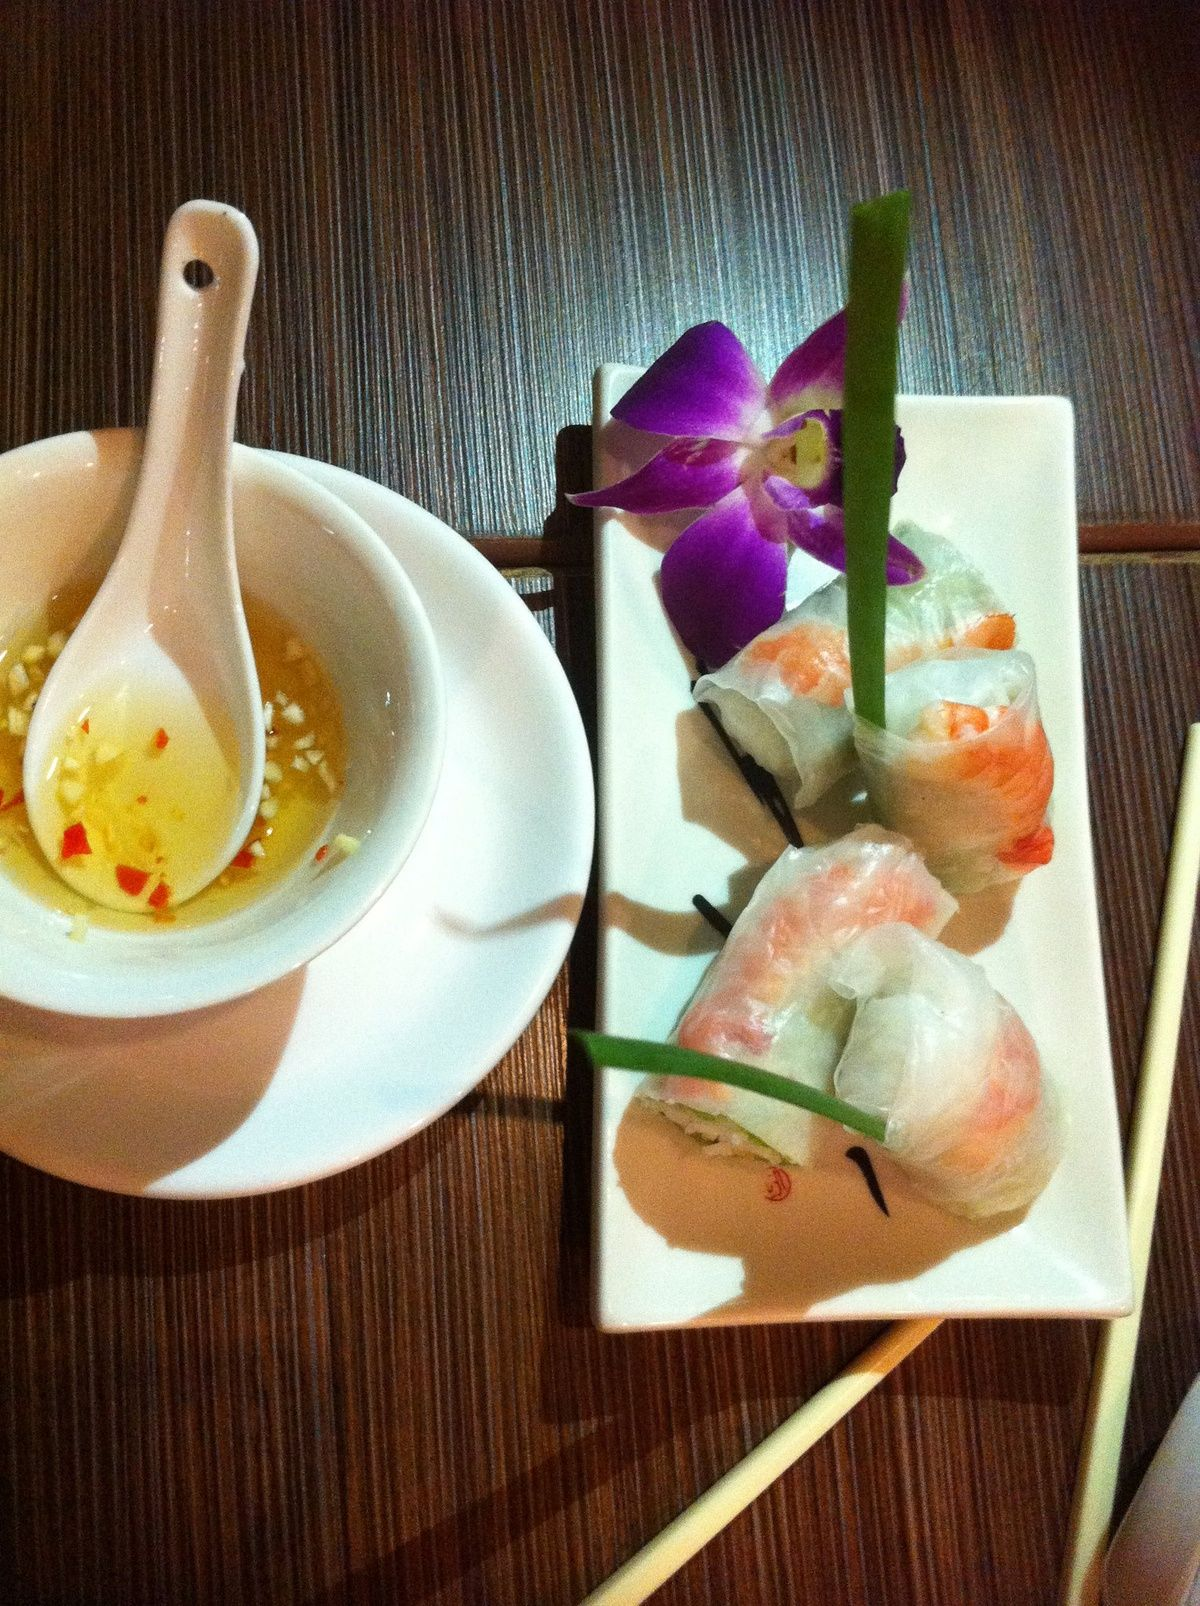 jasmine chinese food near me